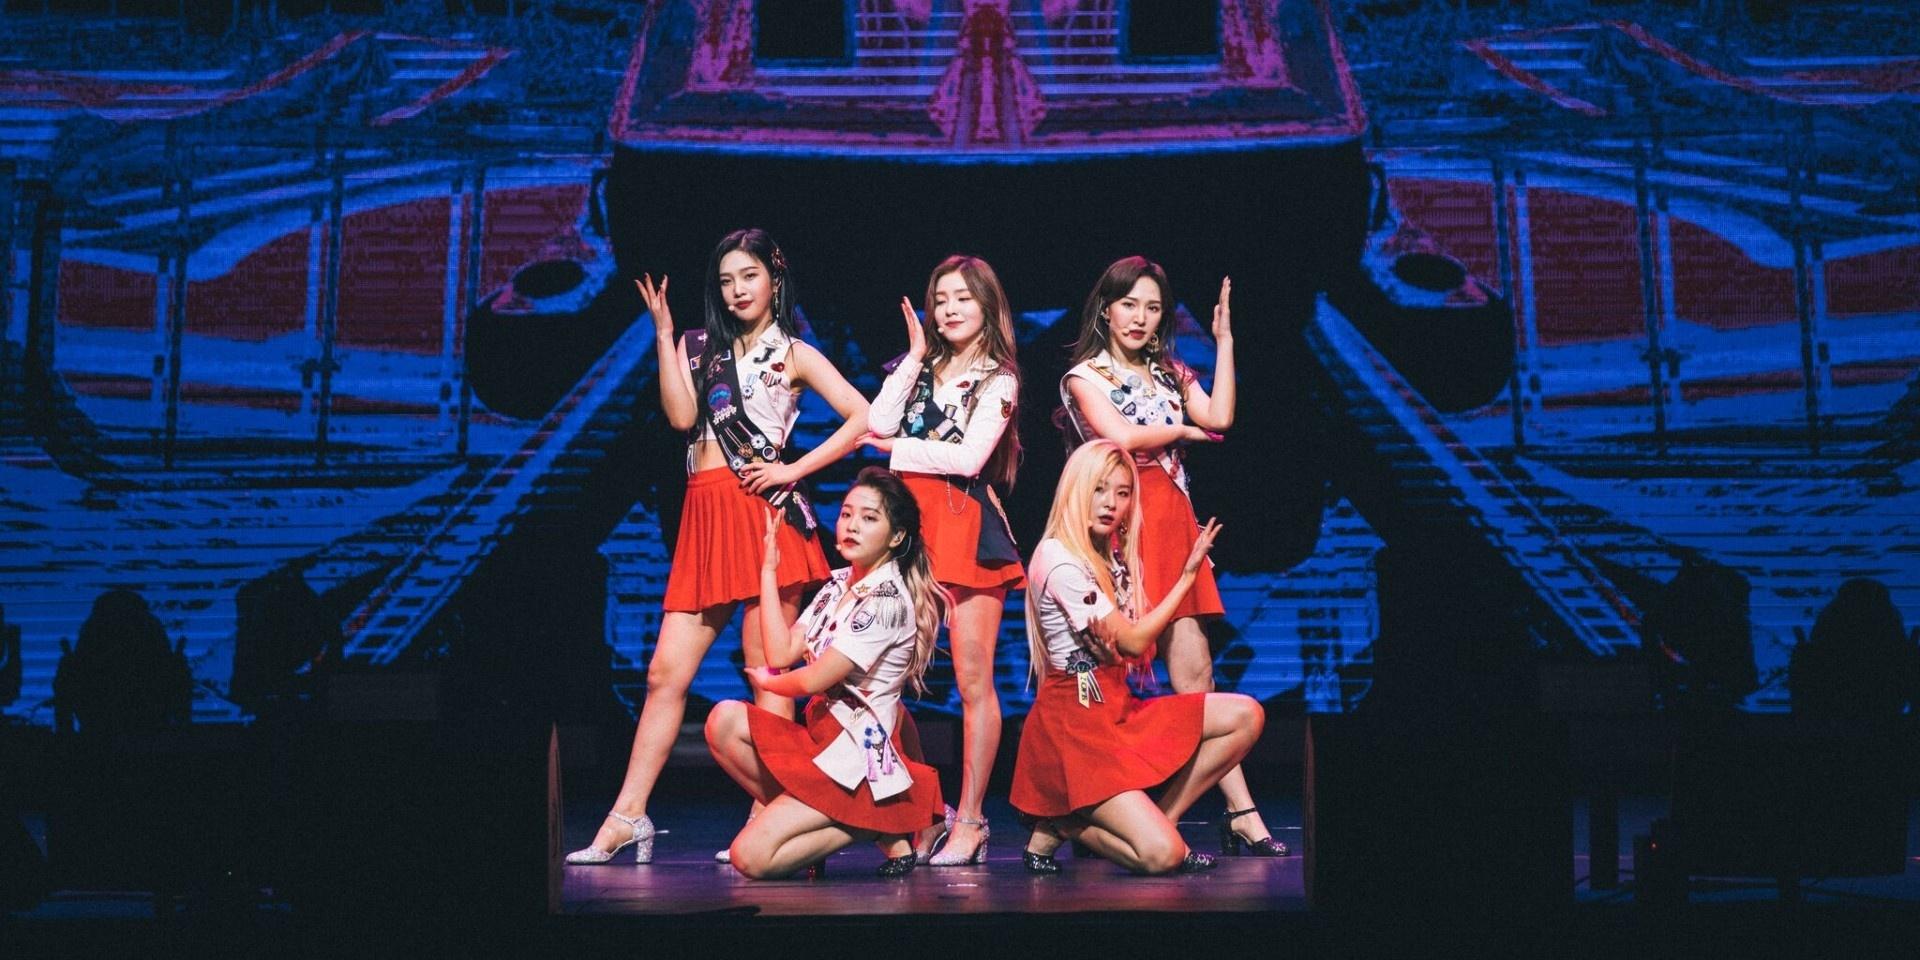 Red Velvet dazzles despite member's injury in Singapore stop of